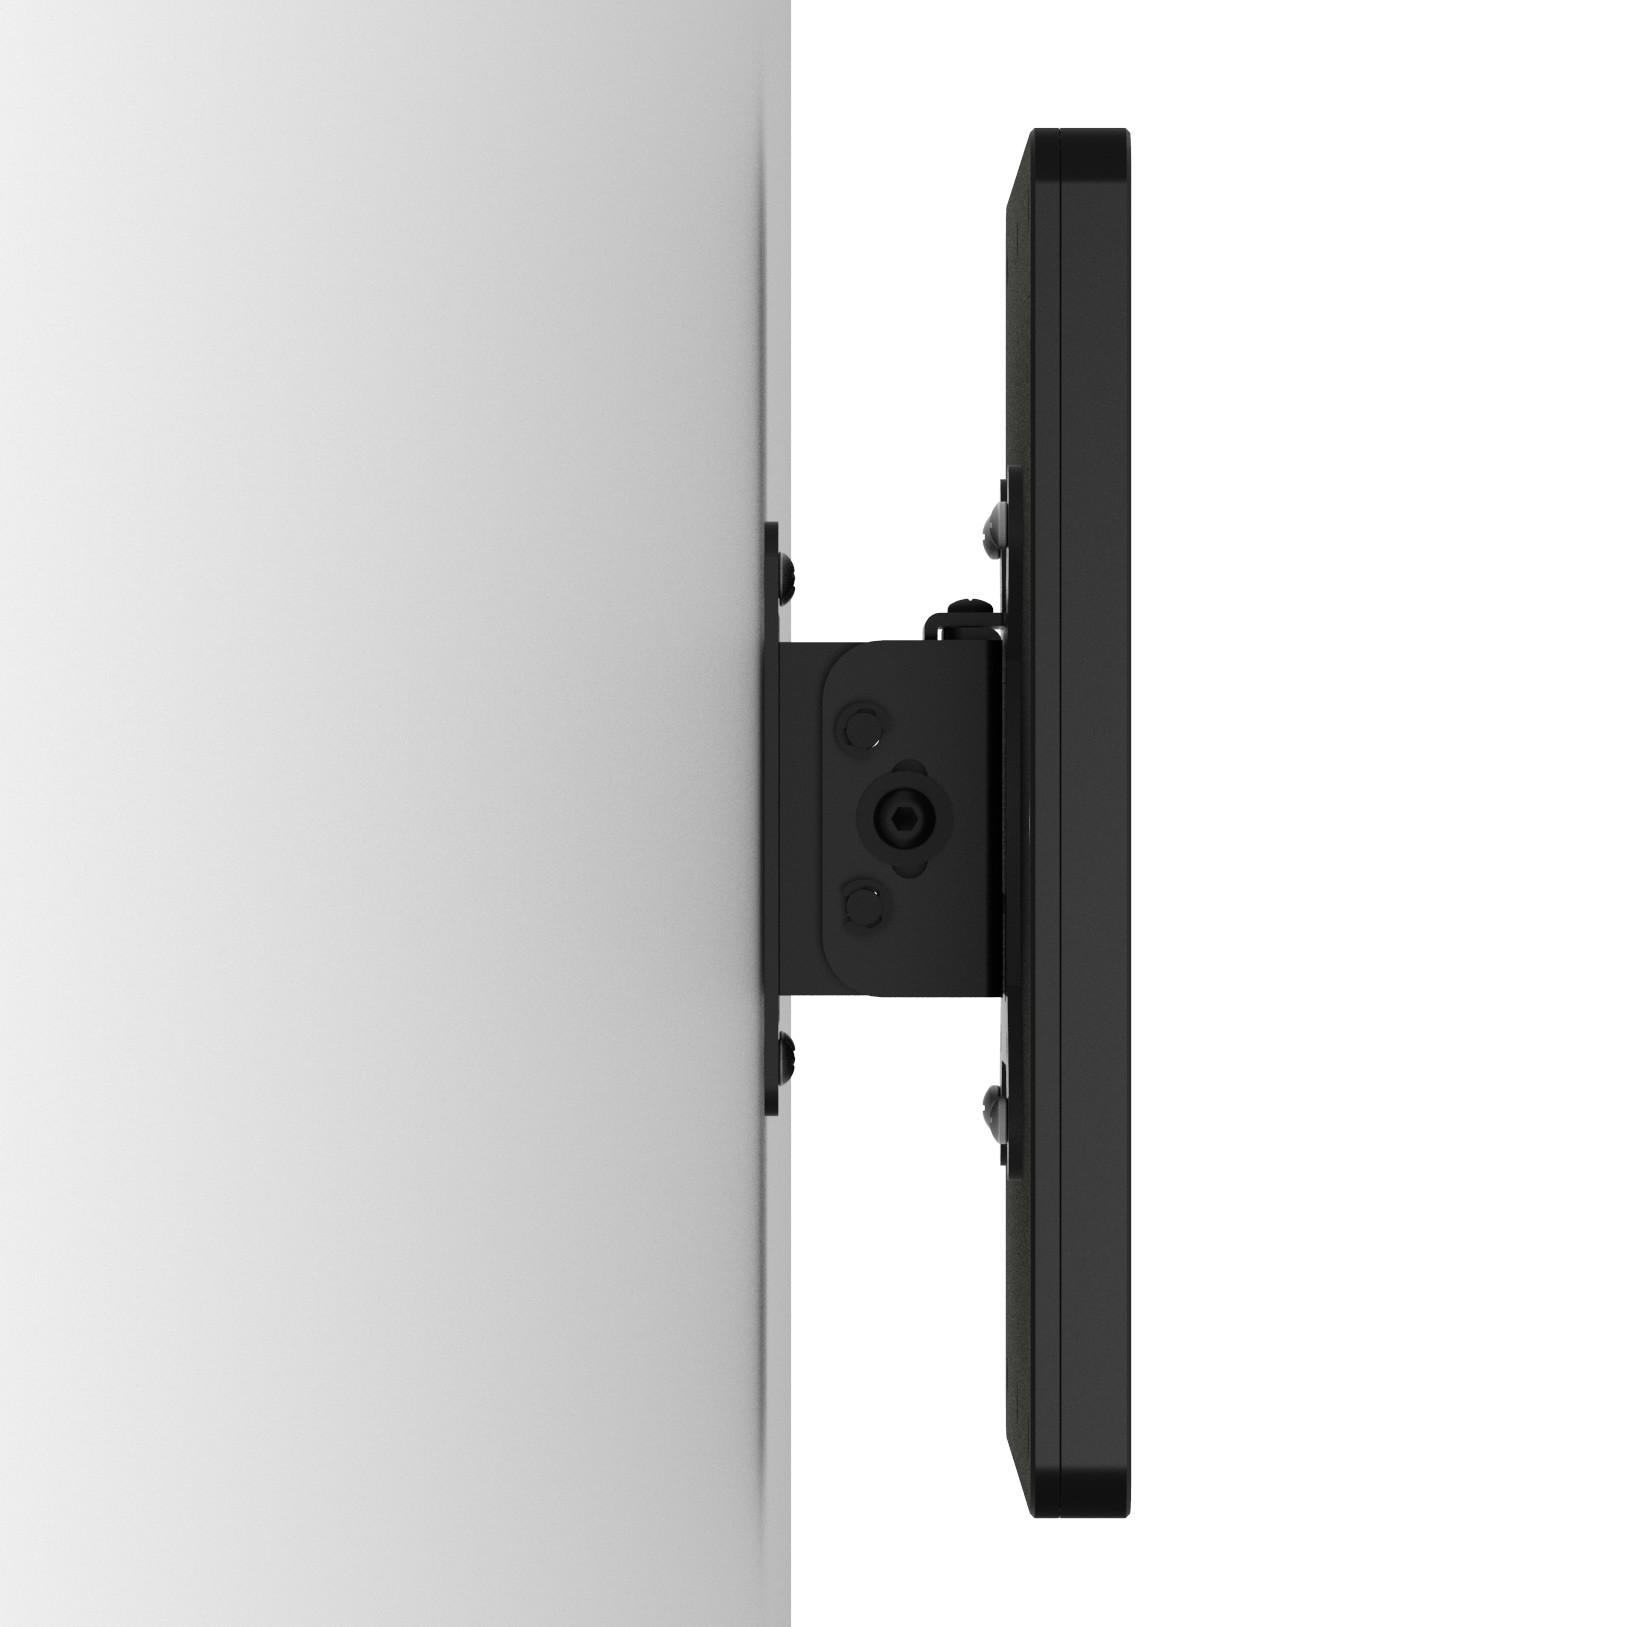 Tilting Wall 10 5 Inch Ipad Pro Tablet Mount Black